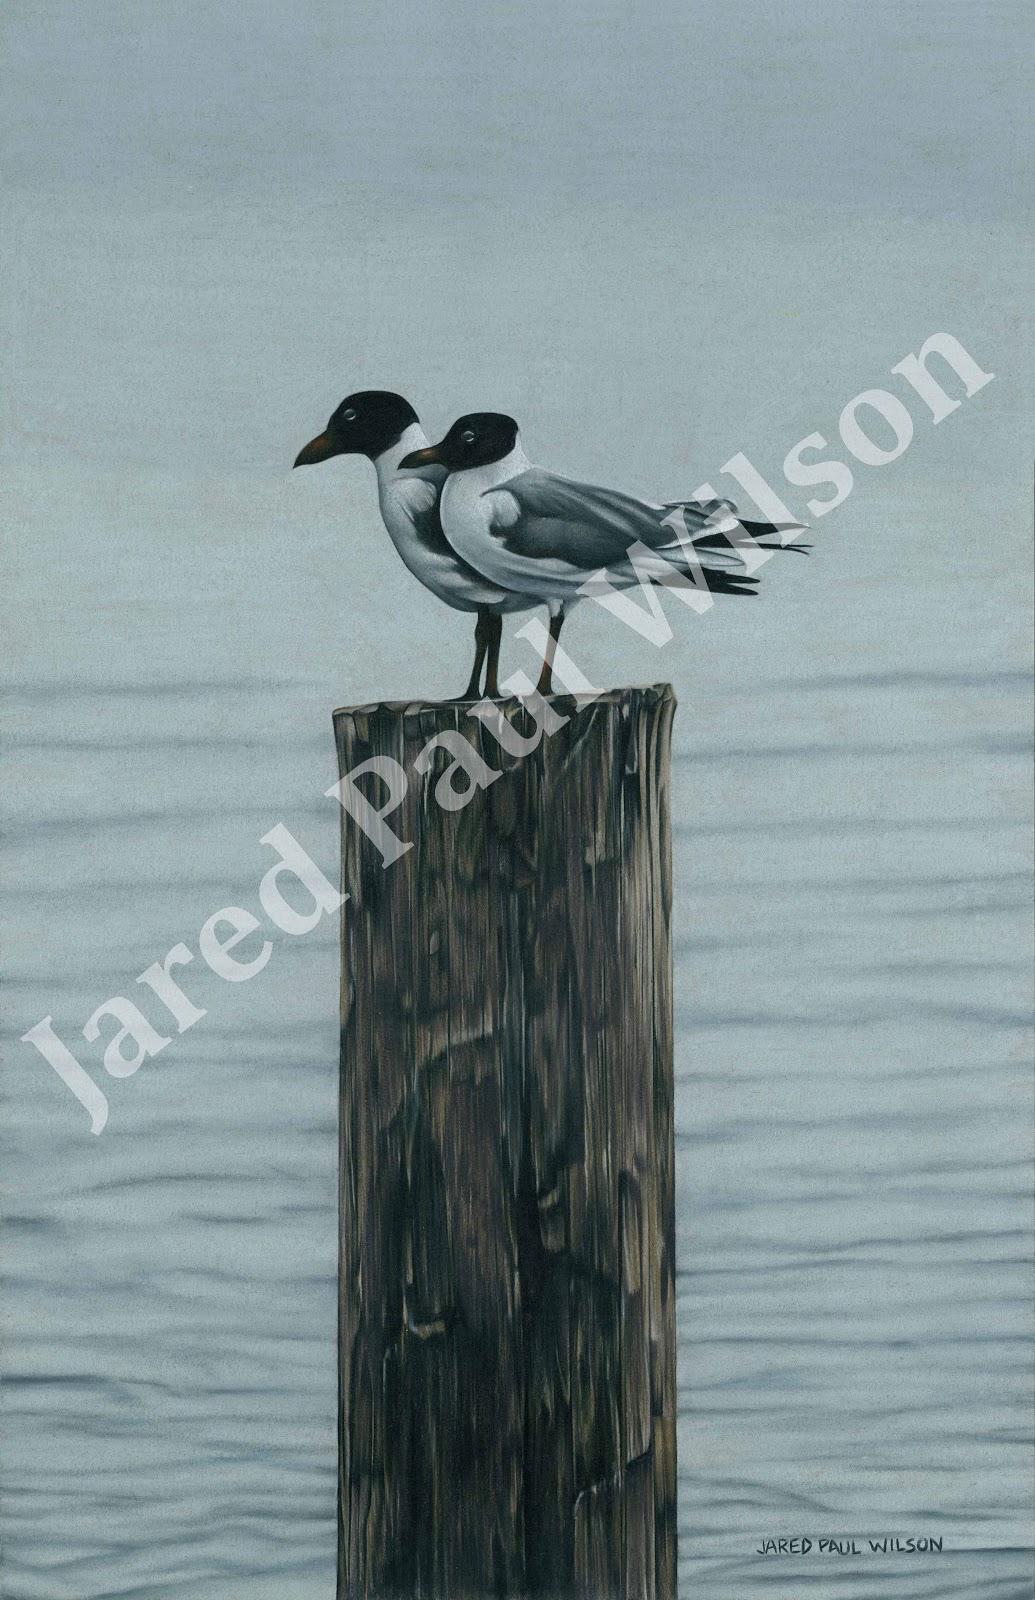 Jared Paul Wilson: Wildlife Art